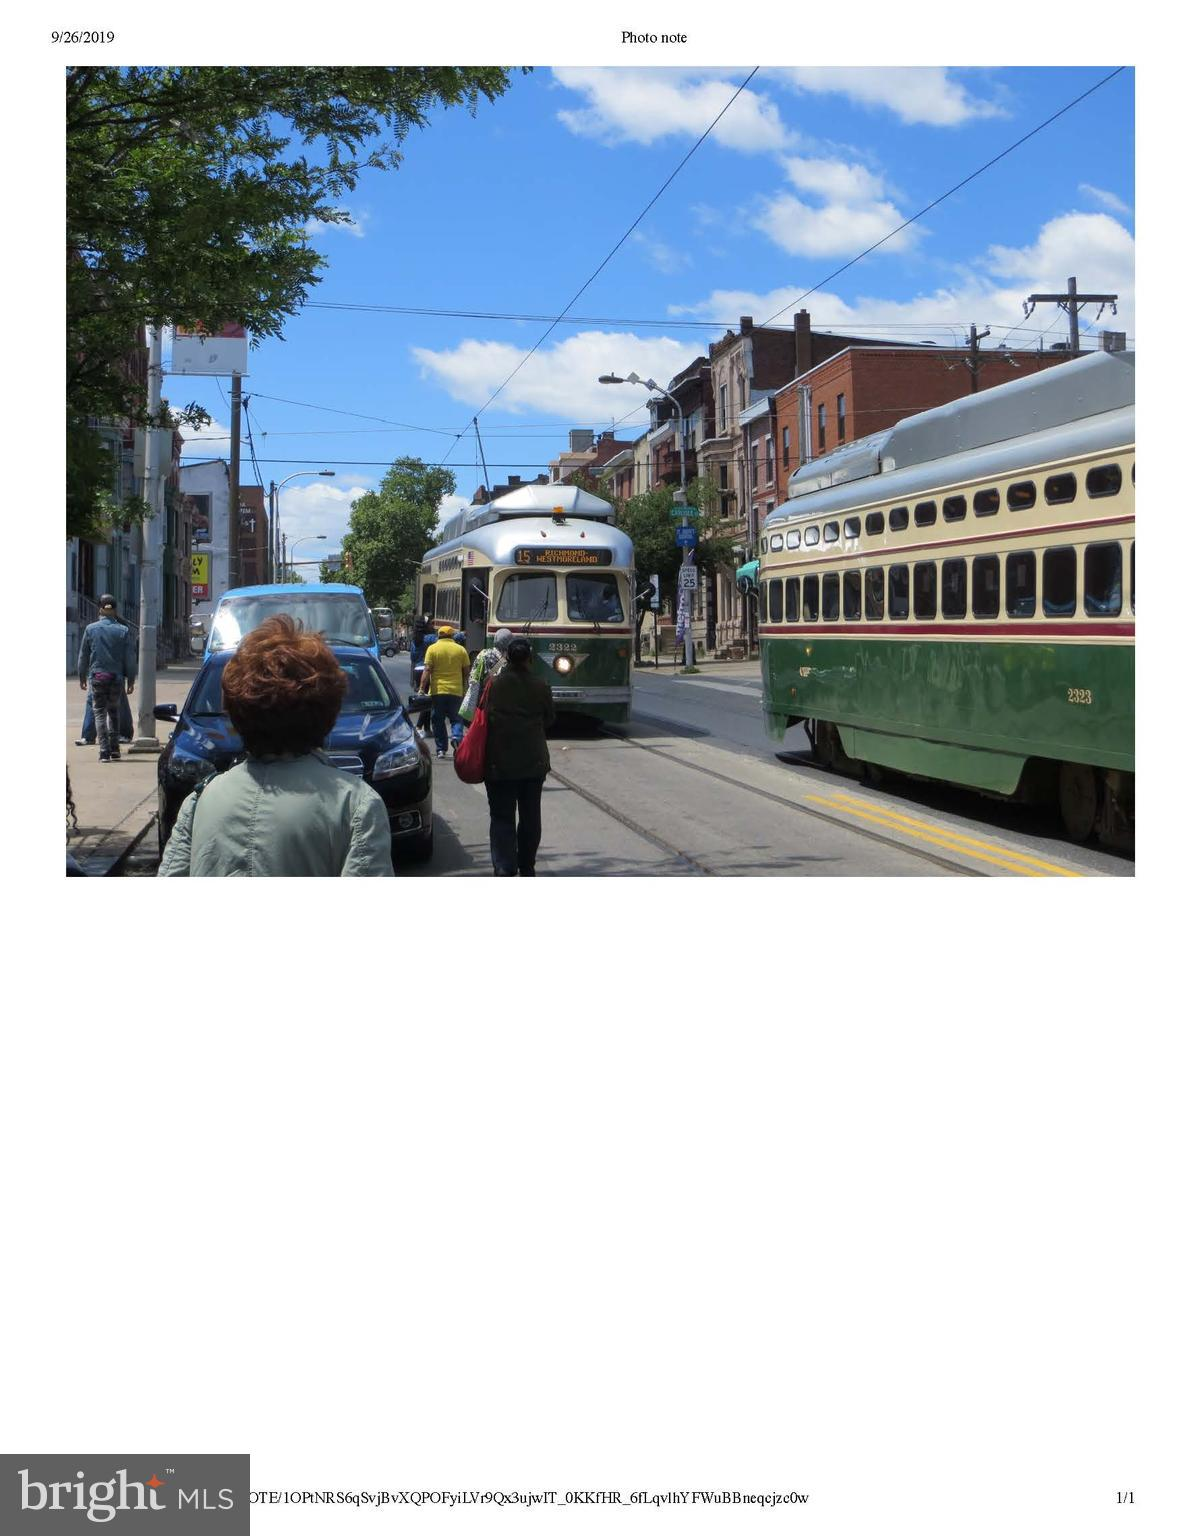 1832 N 23RD STREET, PHILADELPHIA, PA 19121